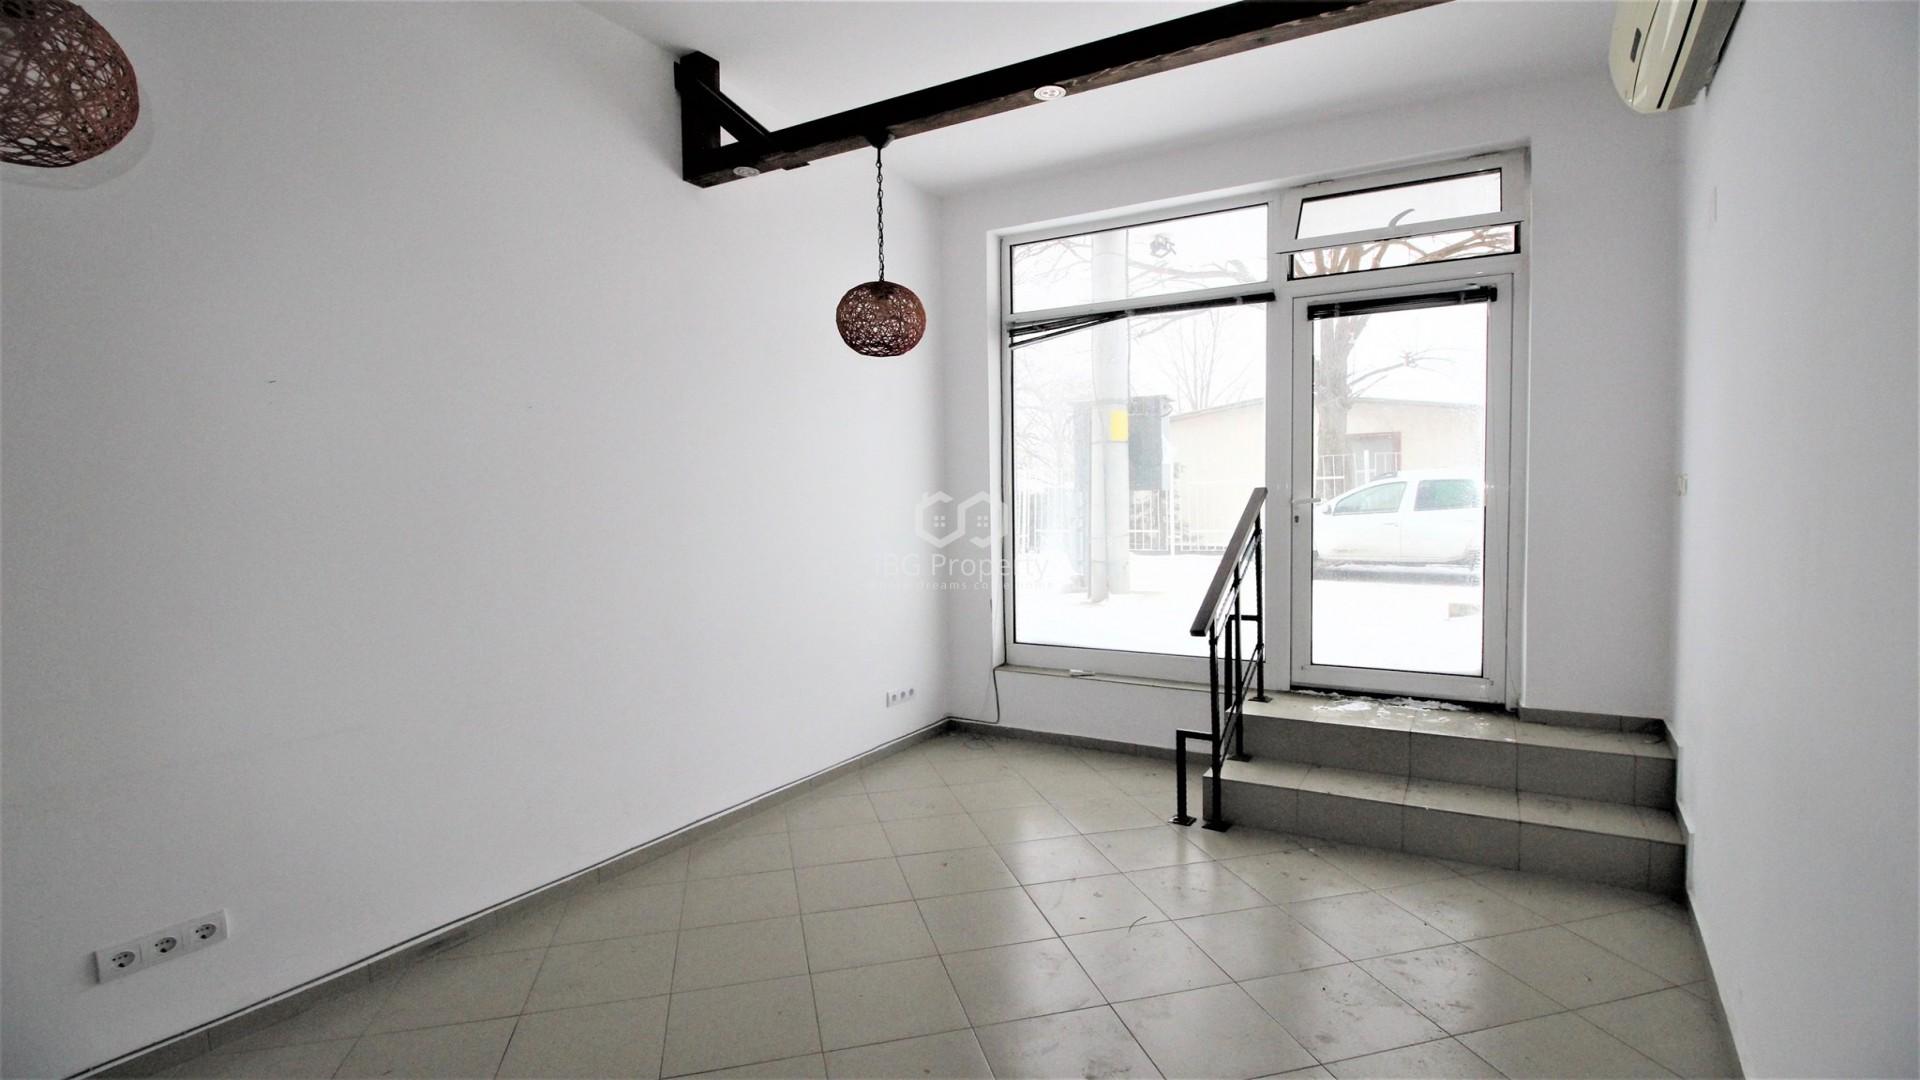 Commercial property sarafovo Burgas 31 m2